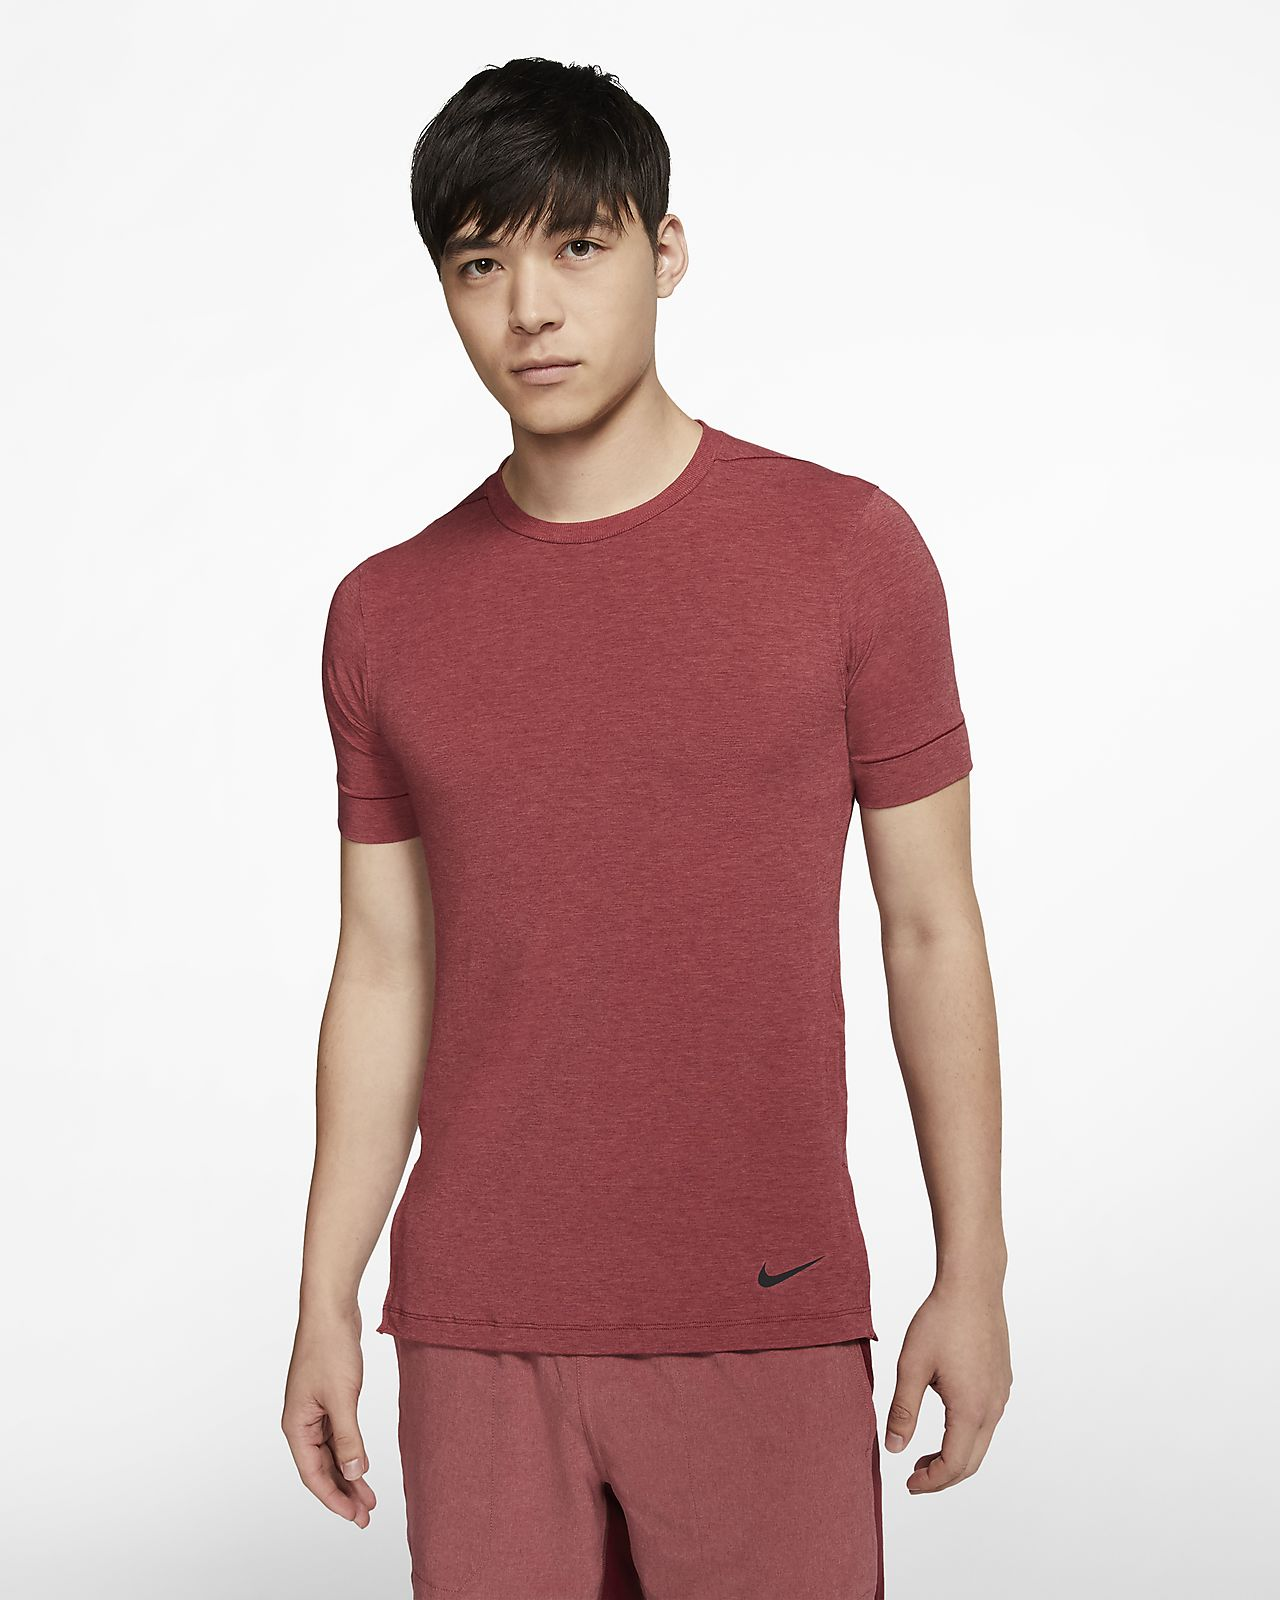 Nike Dri-FIT Camiseta de entrenamiento de yoga de manga corta - Hombre